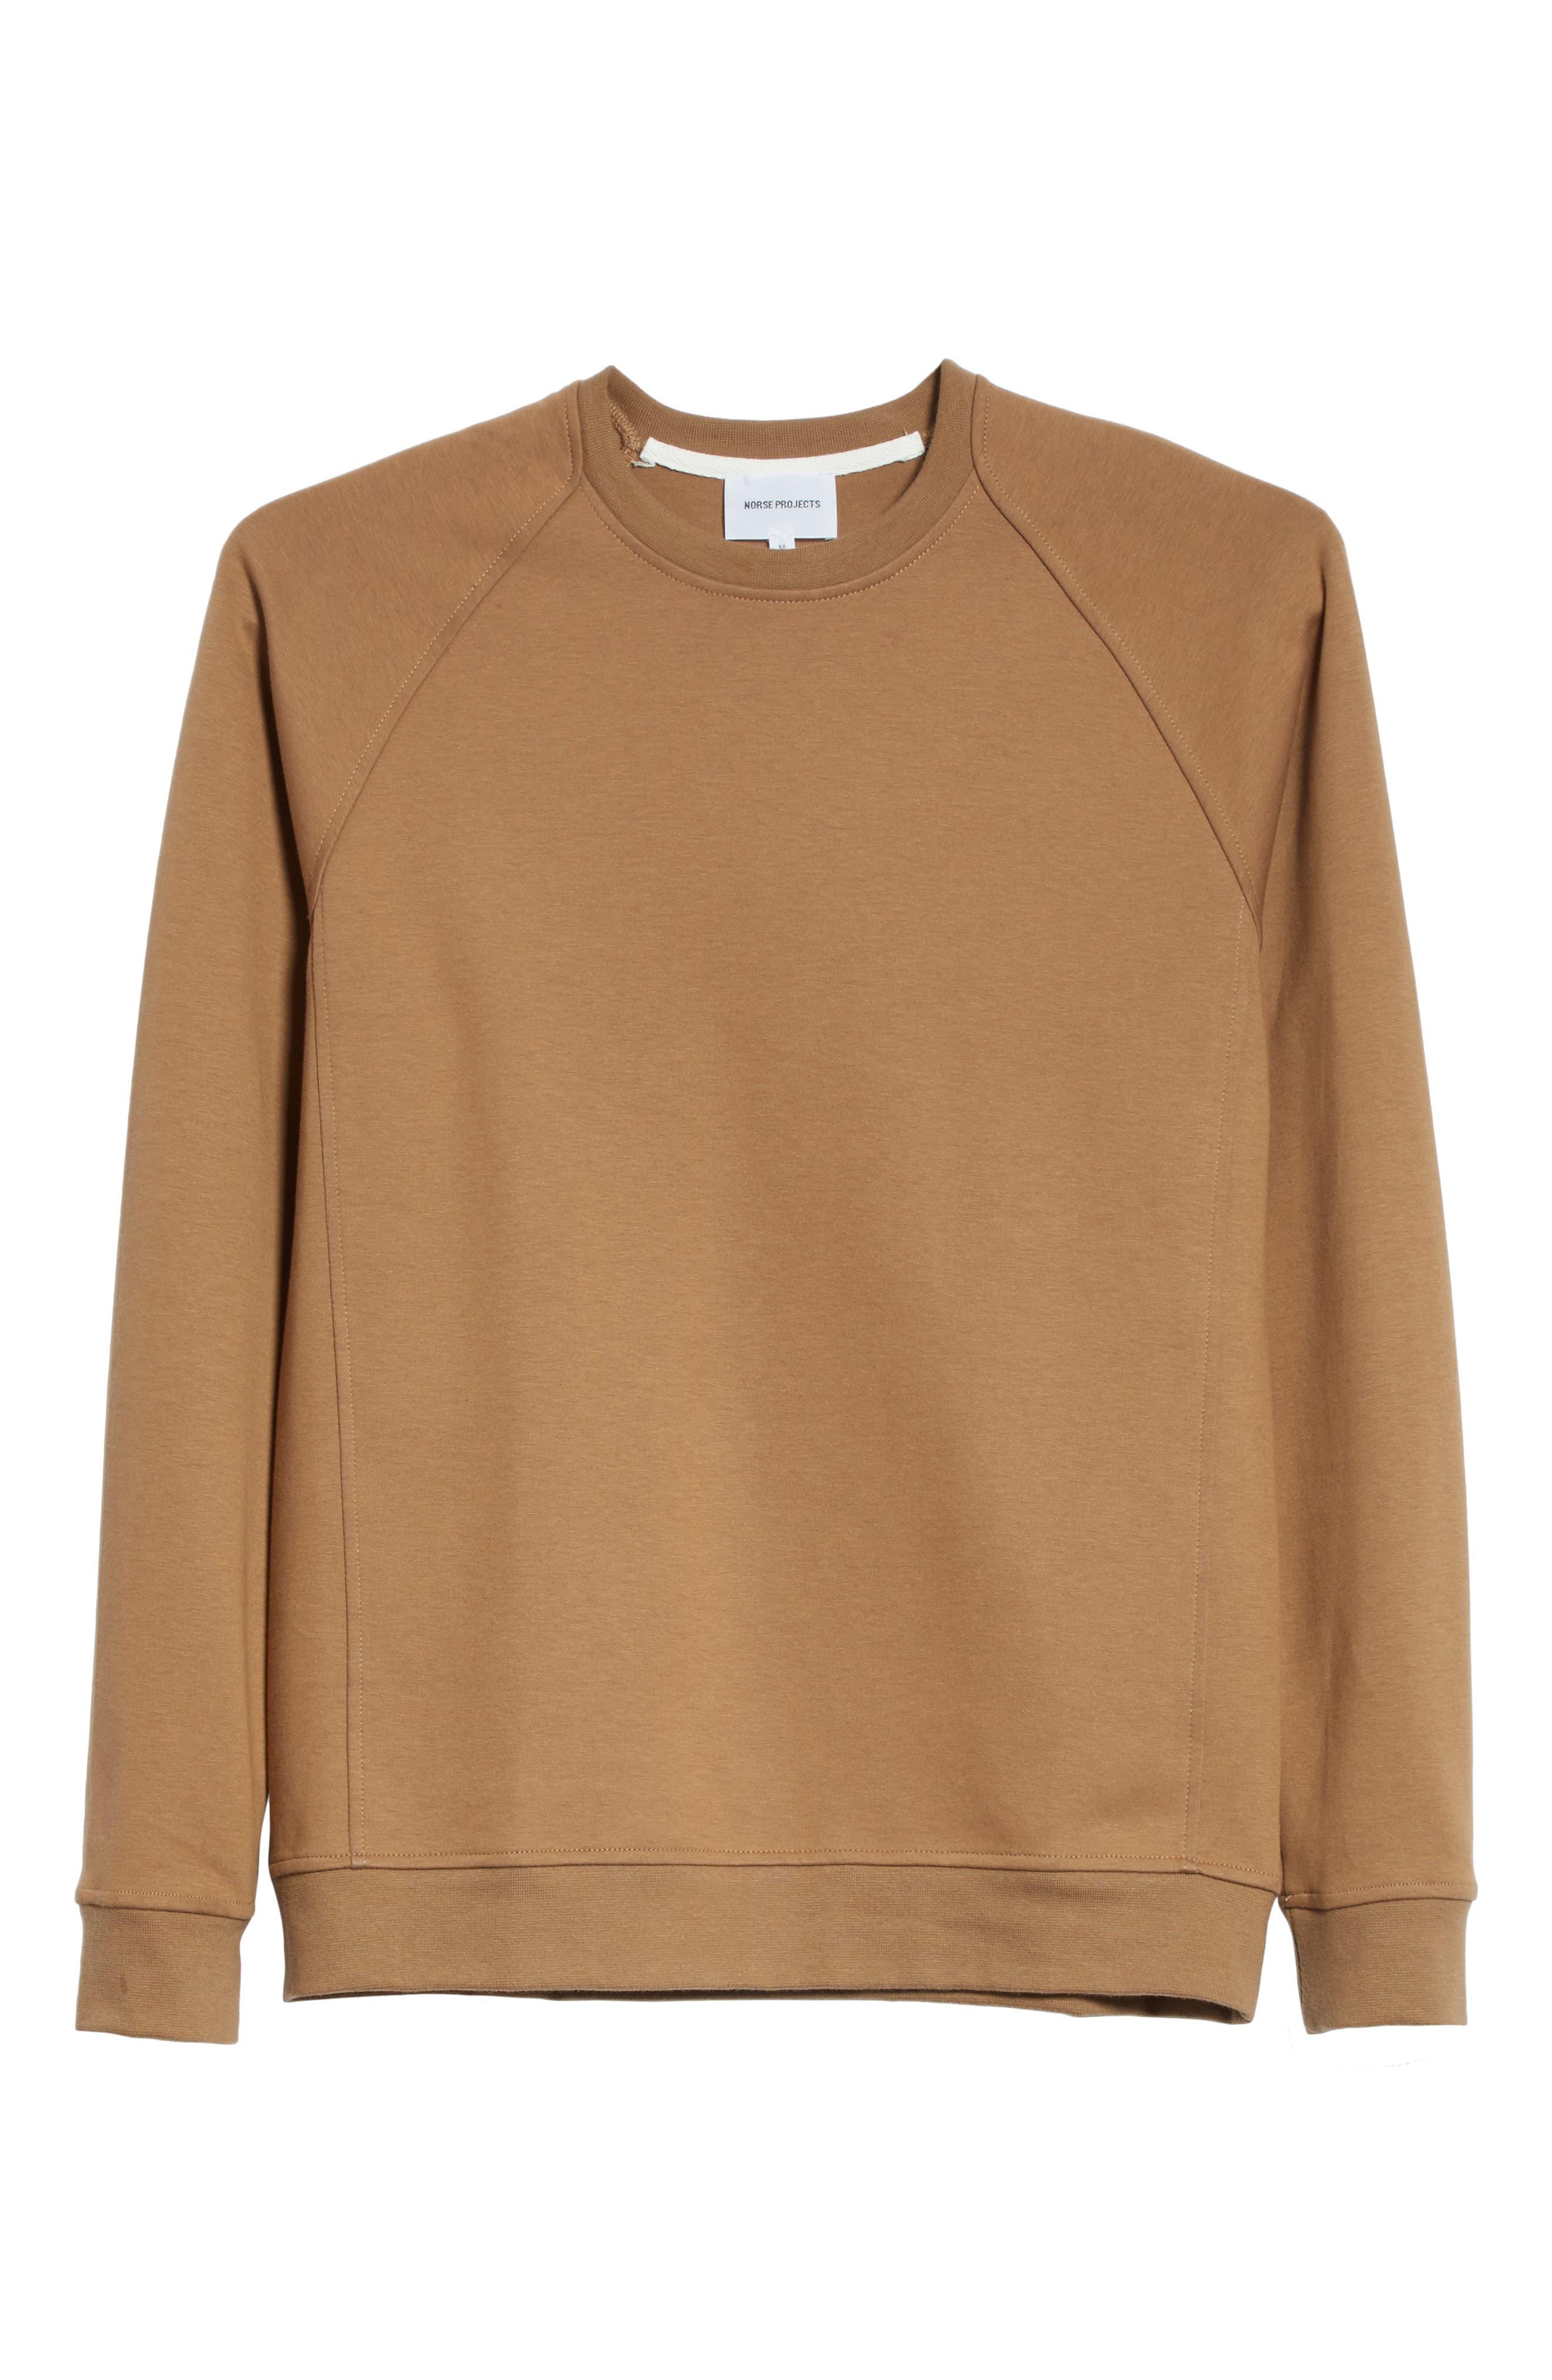 Ketel Dry Mercerized Crewneck Sweatshirt,                             Alternate thumbnail 6, color,                             Light Sand